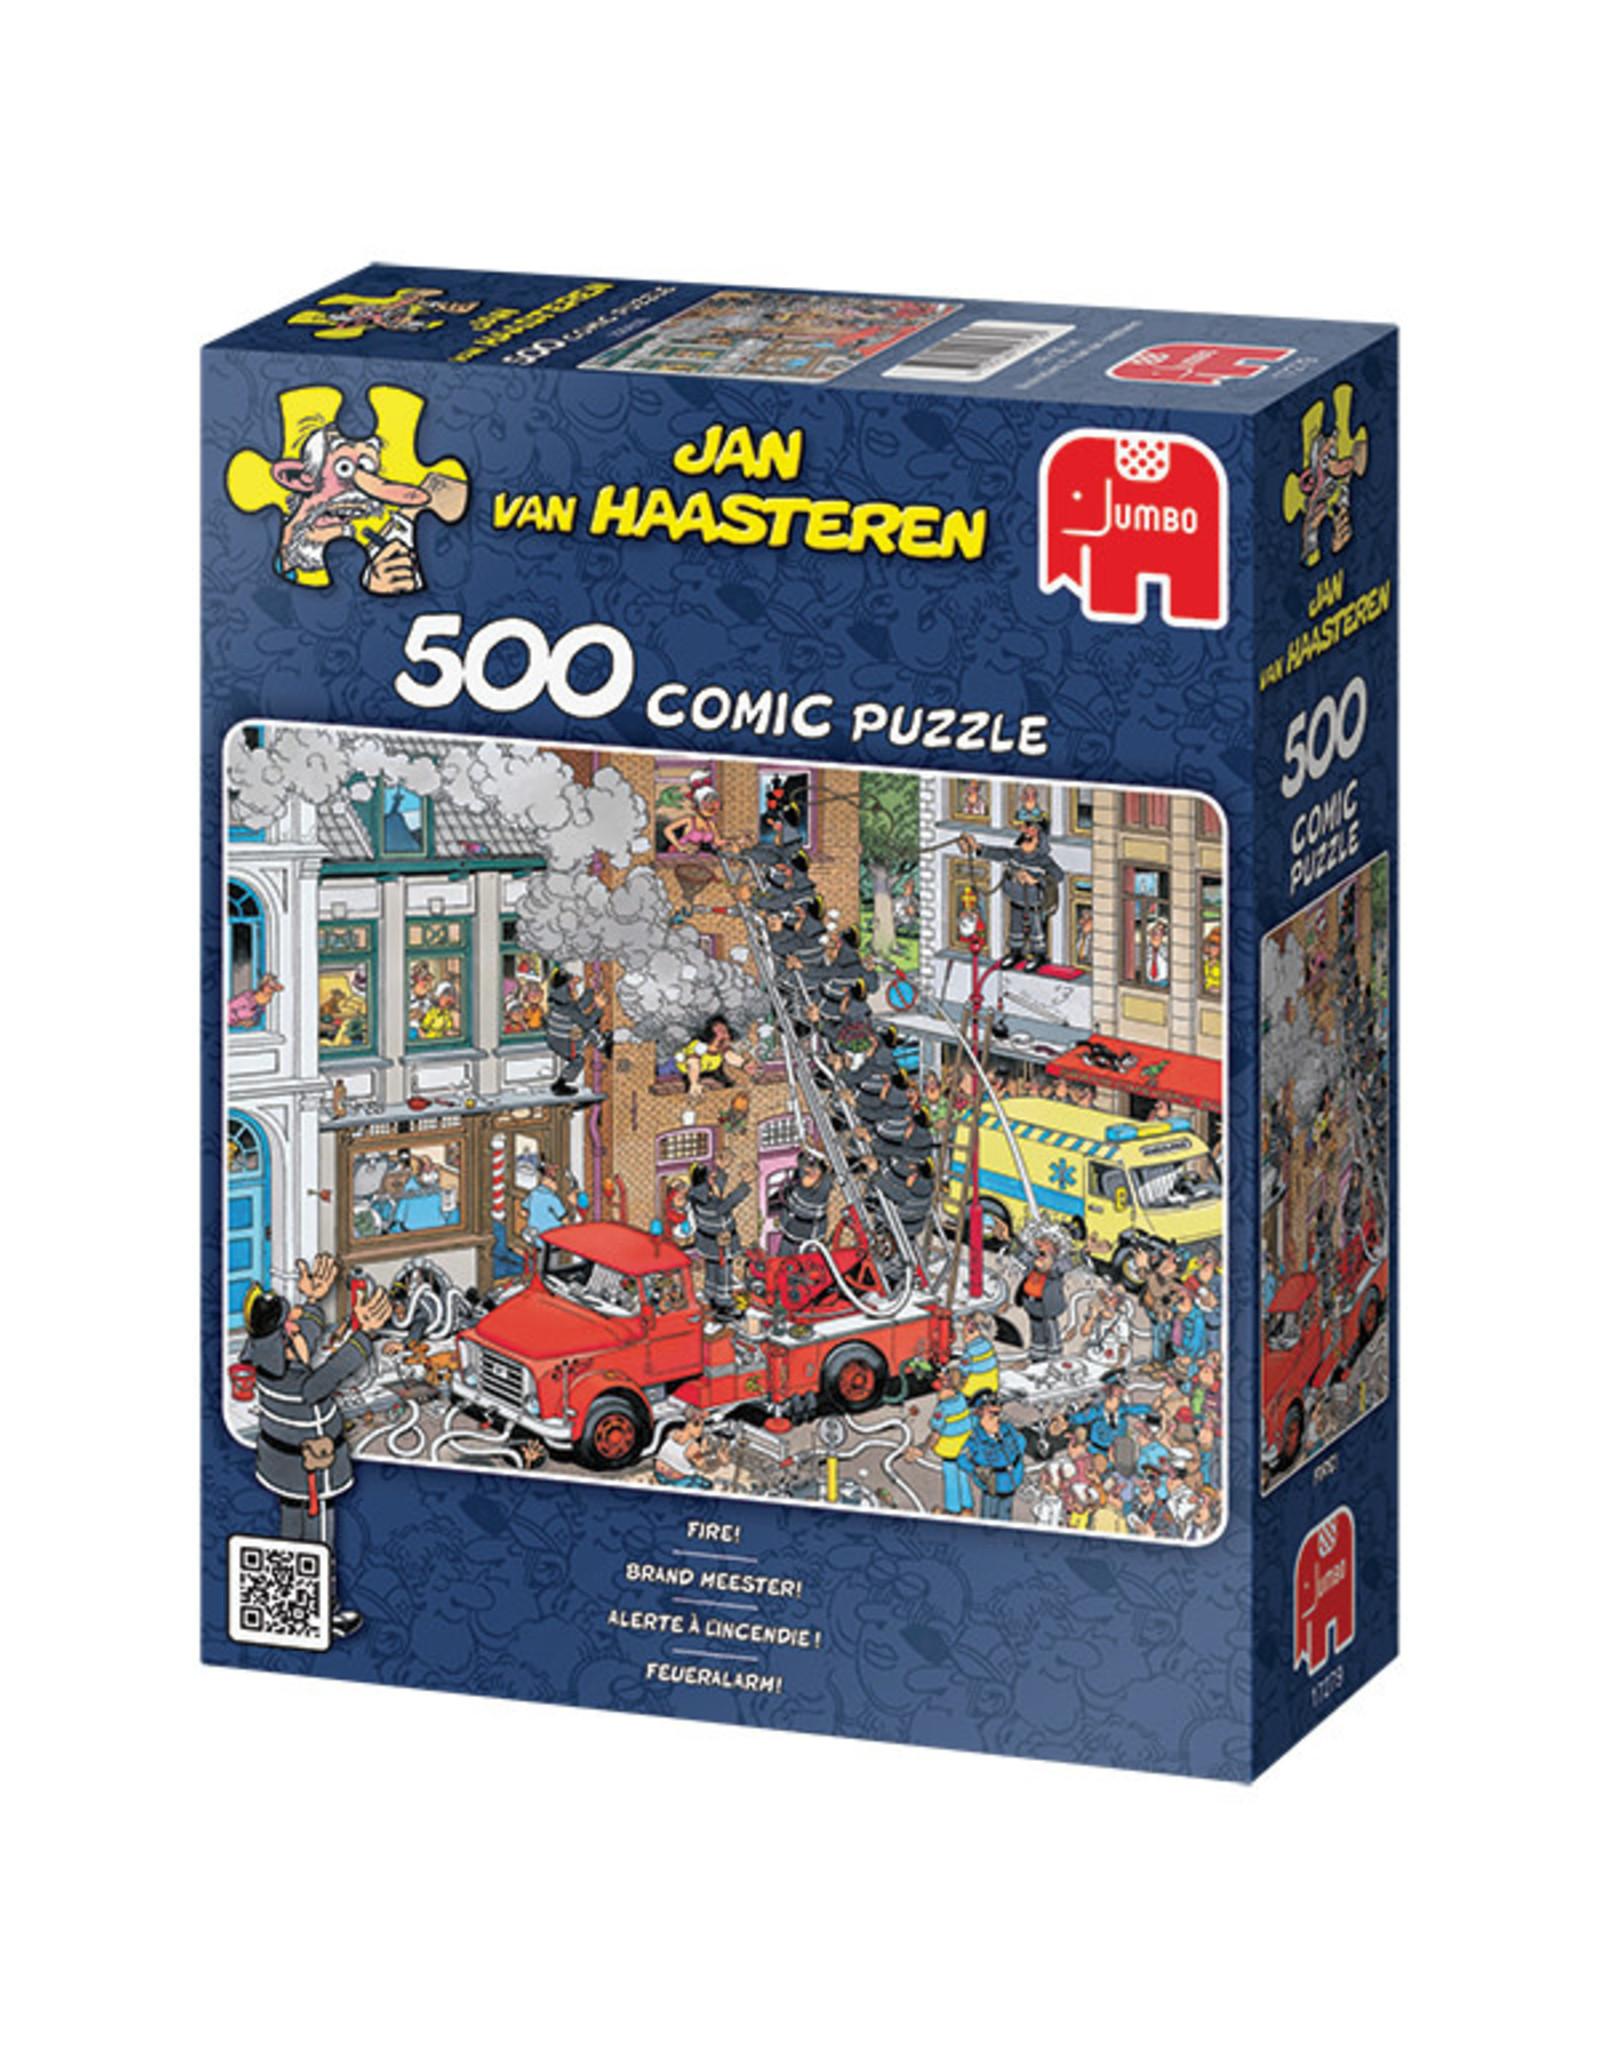 Jumbo Jan van Haasteren Fire Marshall 500pc Puzzle